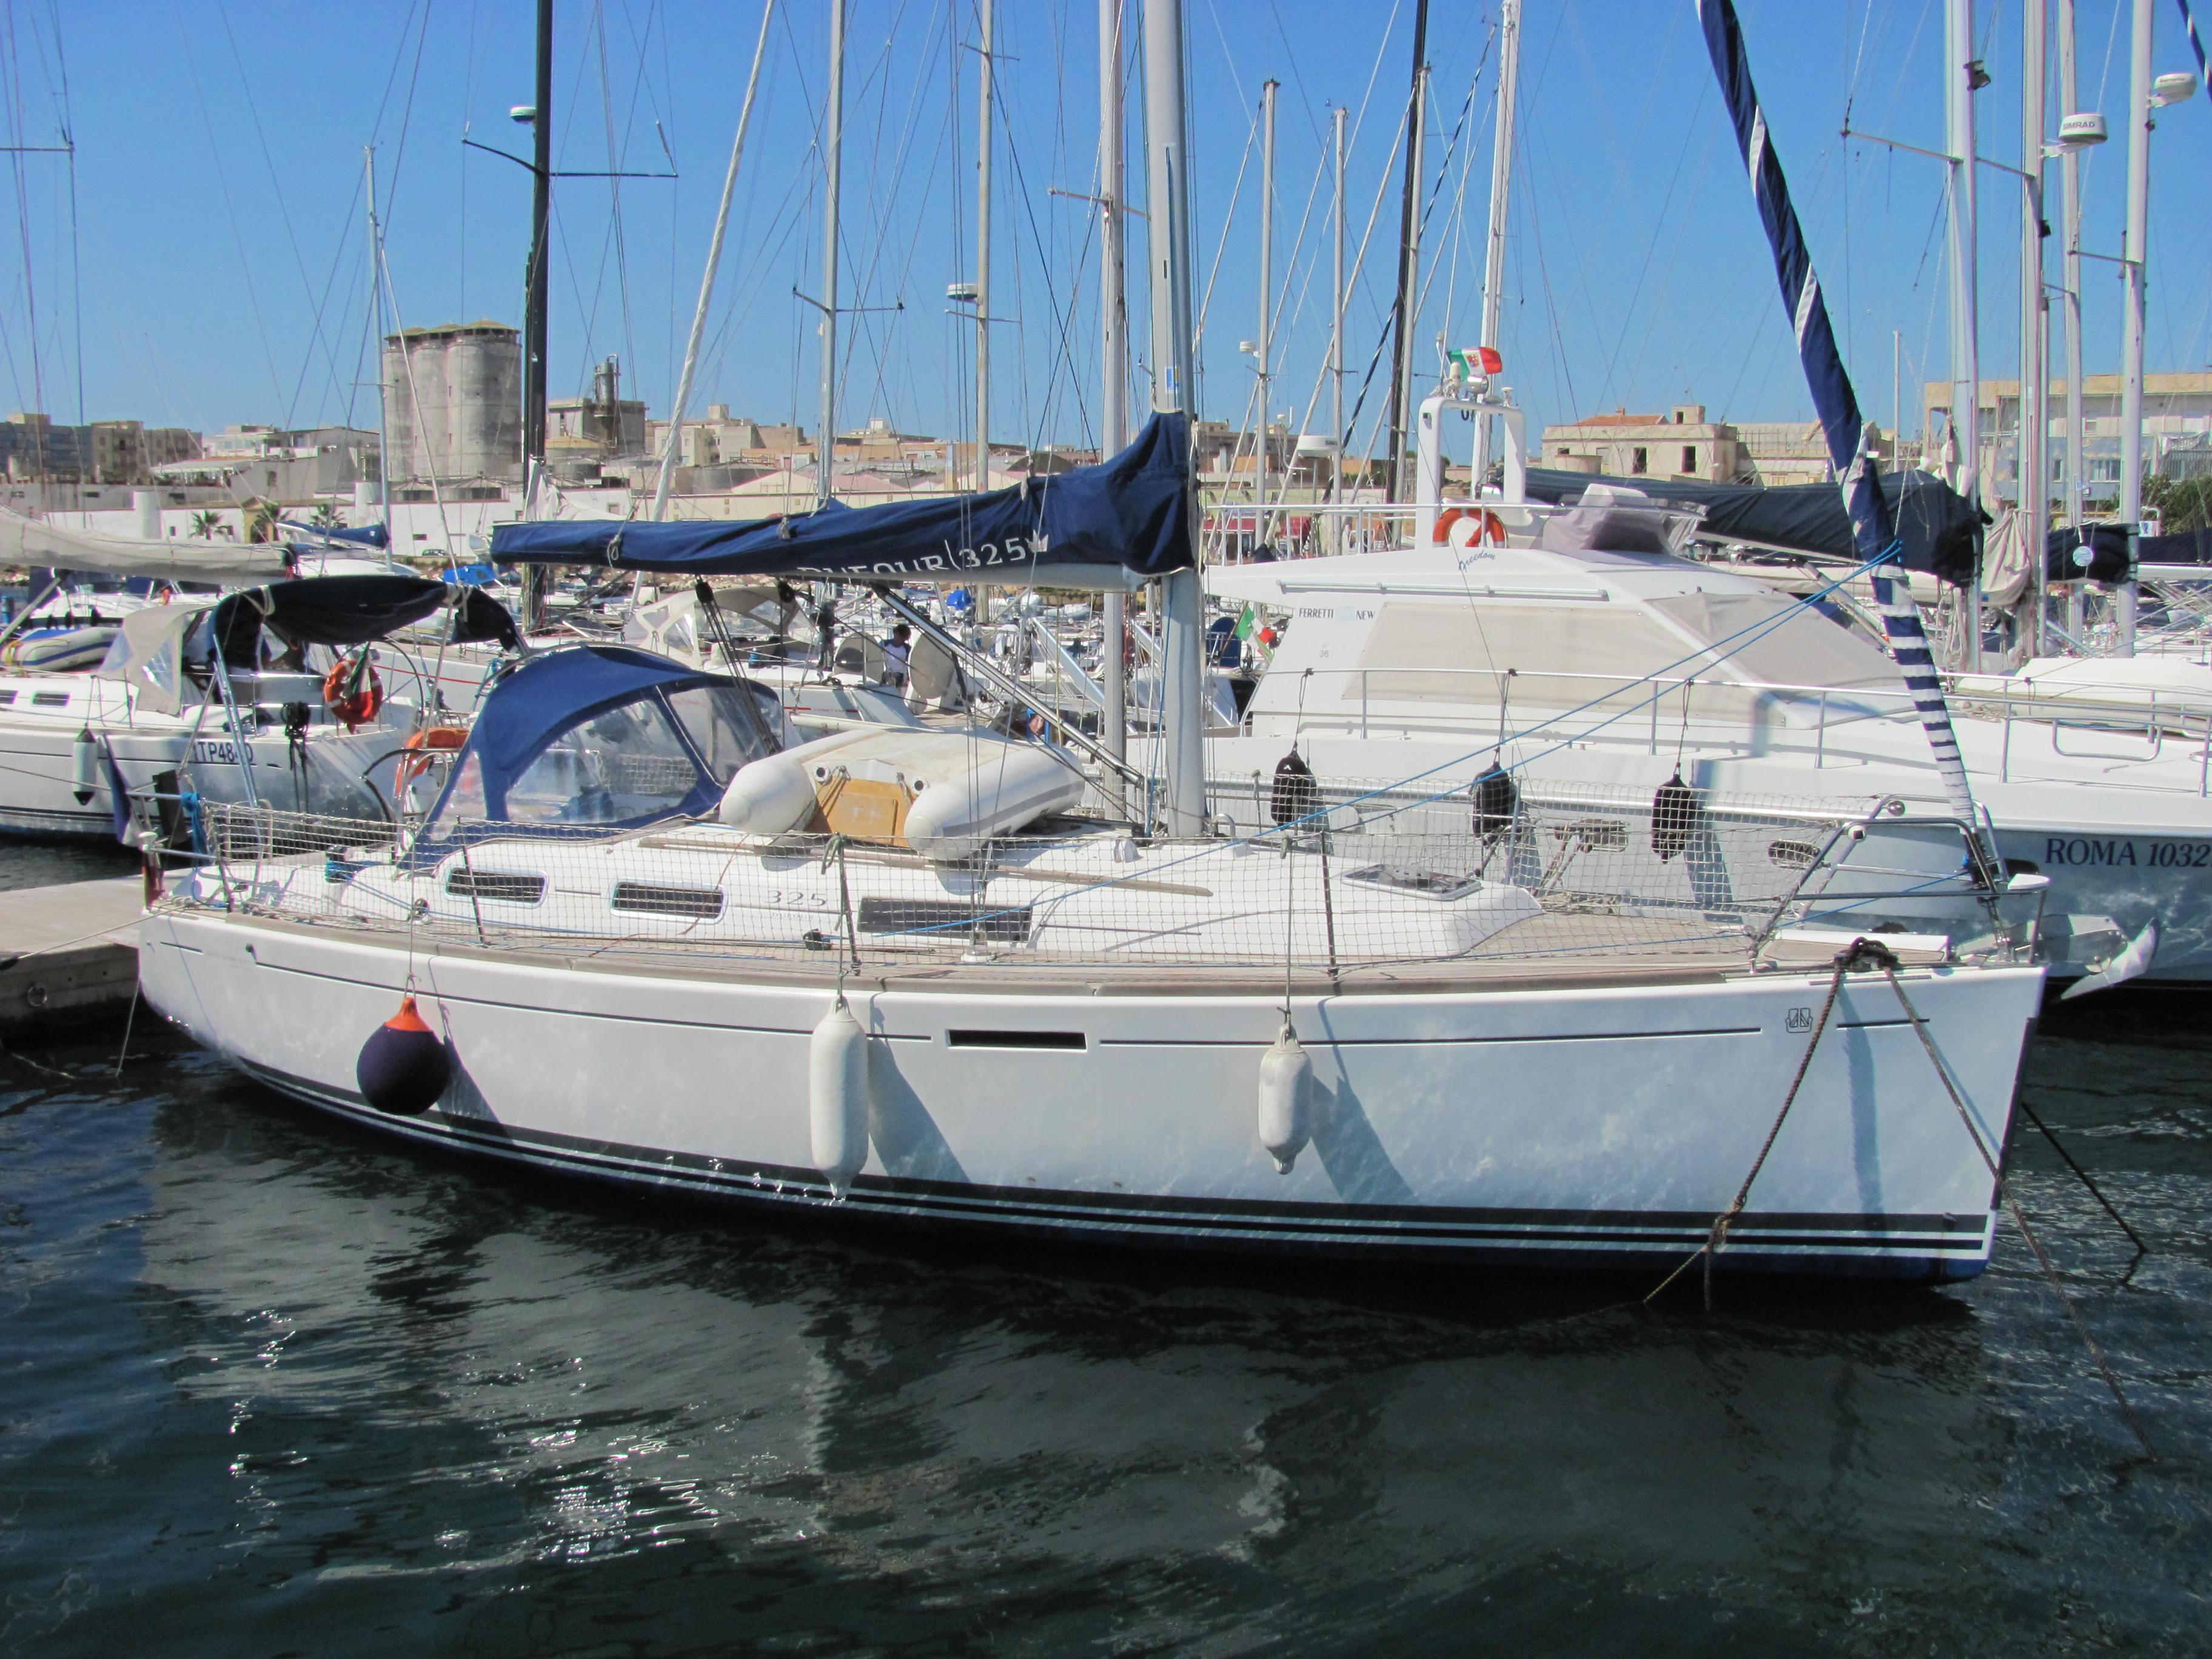 Affitto barca a vela a Trapani